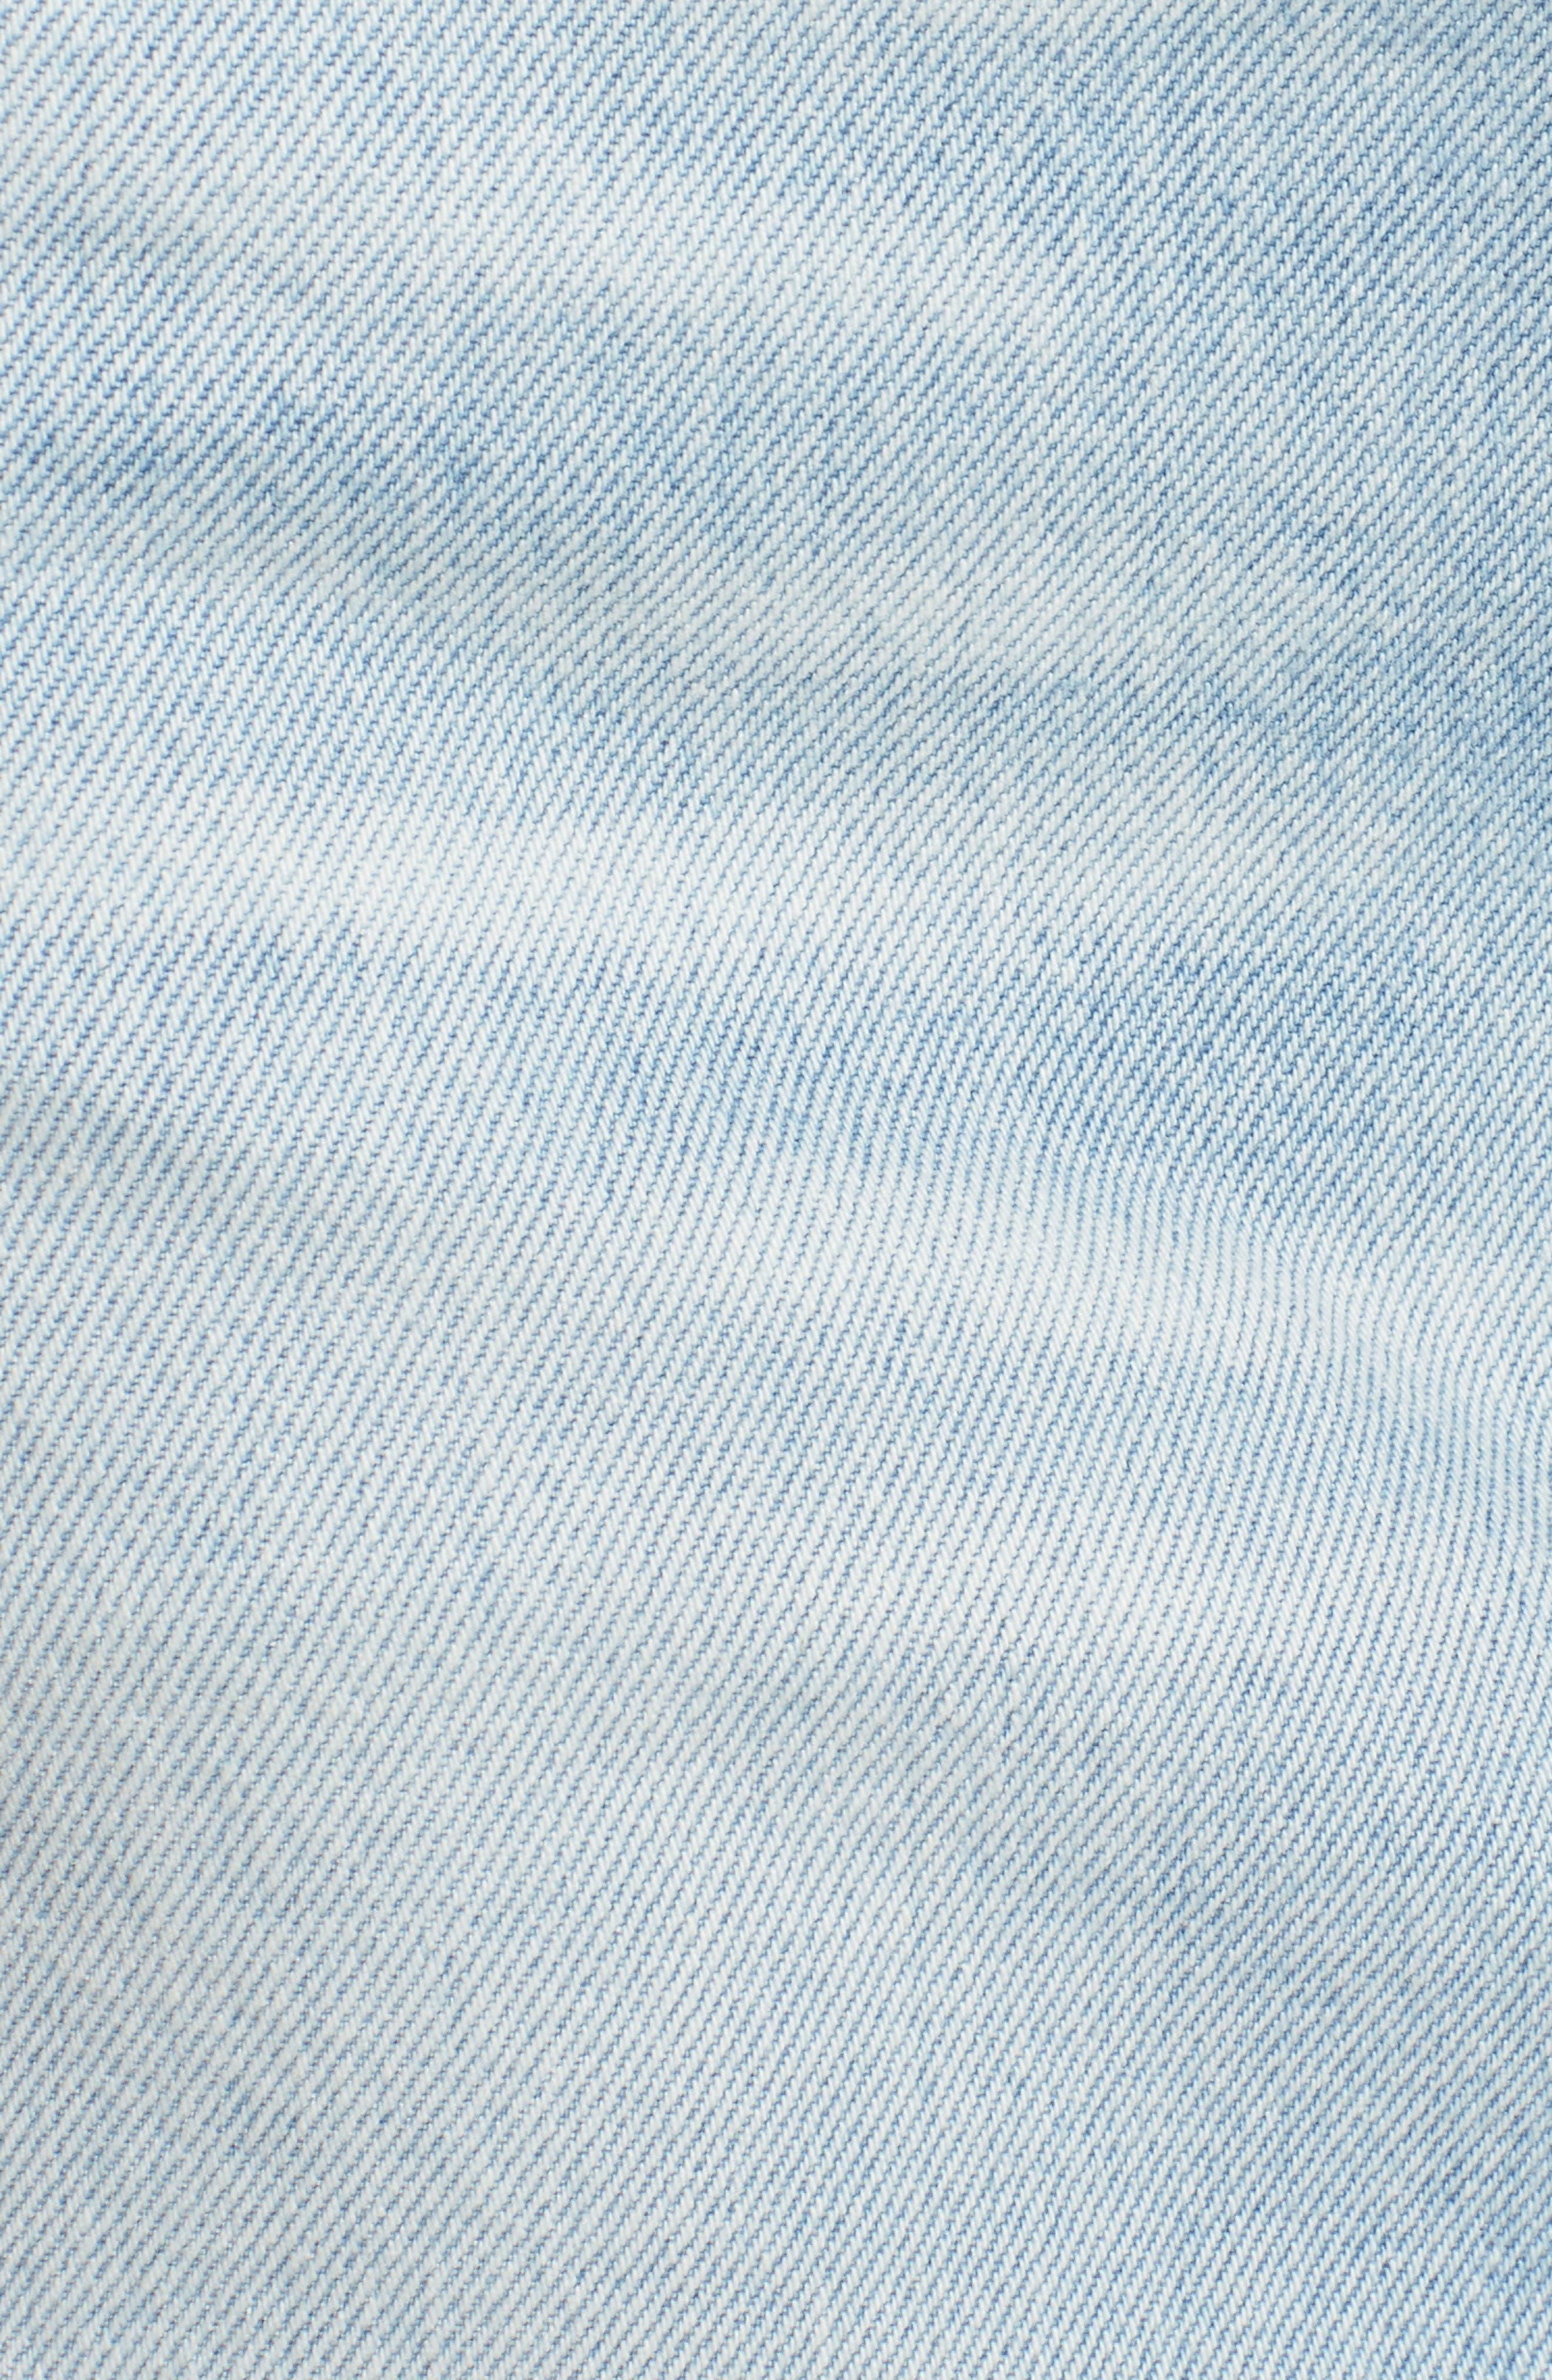 Quinn High Waist Cutoff Denim Miniskirt,                             Alternate thumbnail 5, color,                             VEGA